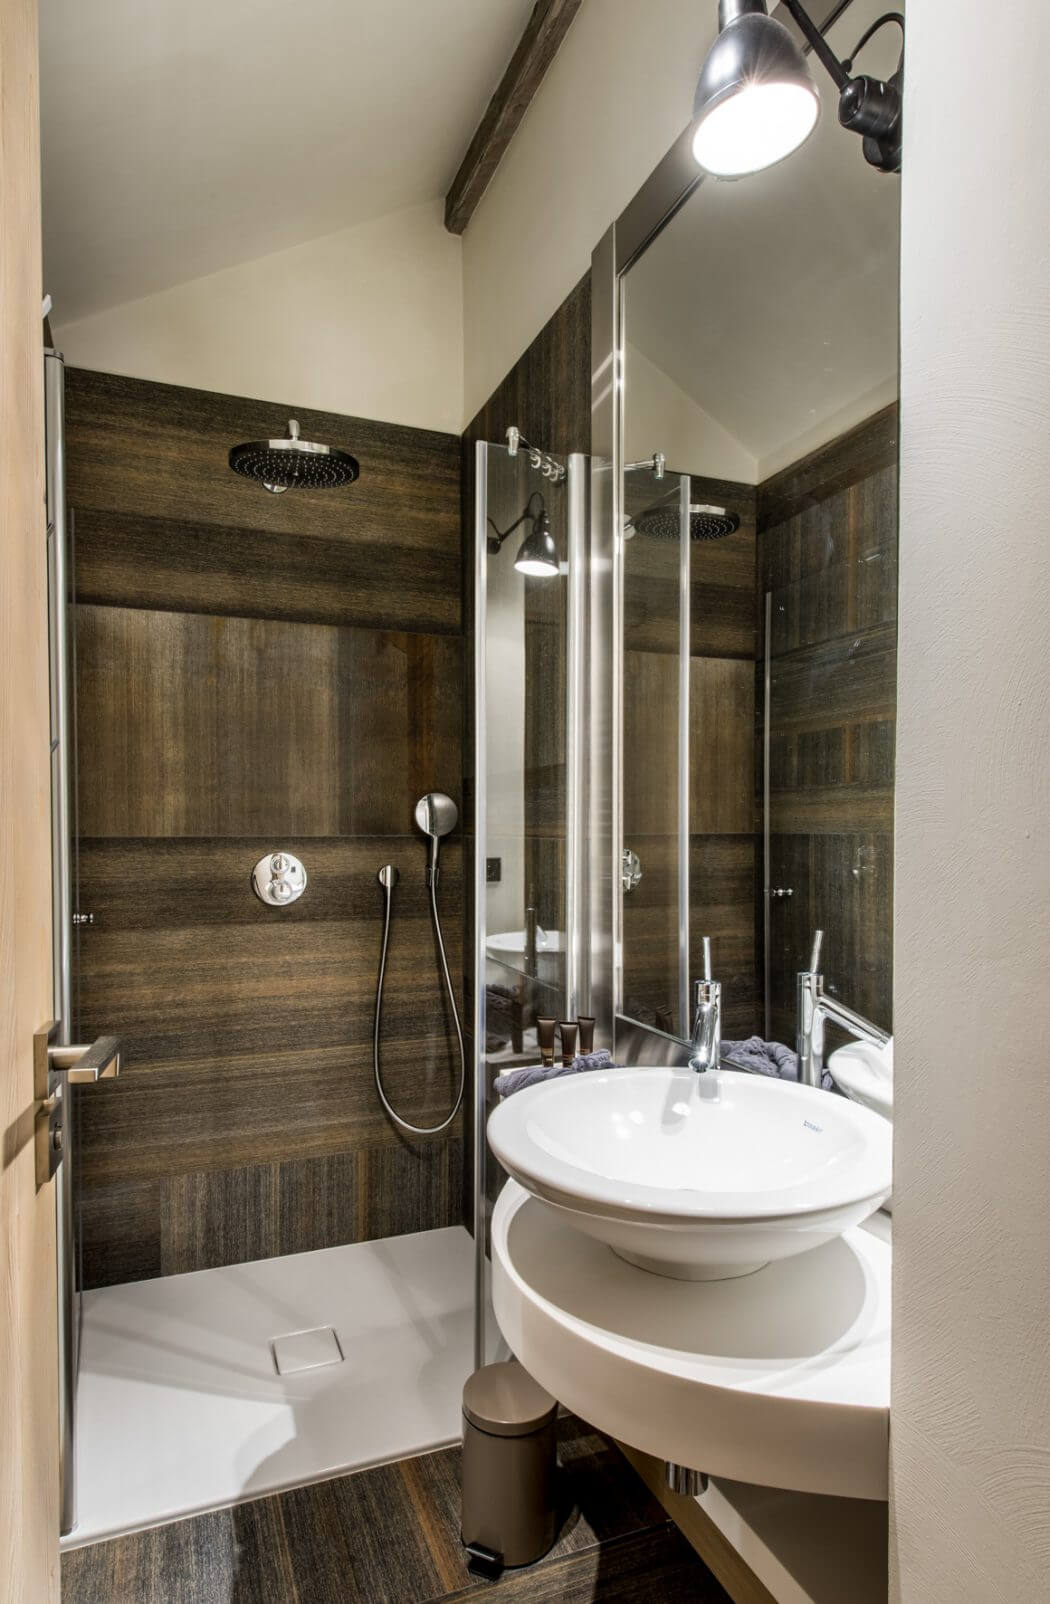 Chalet design by amdeco architecture d 39 int rieur homeadore for Interieur chalet design